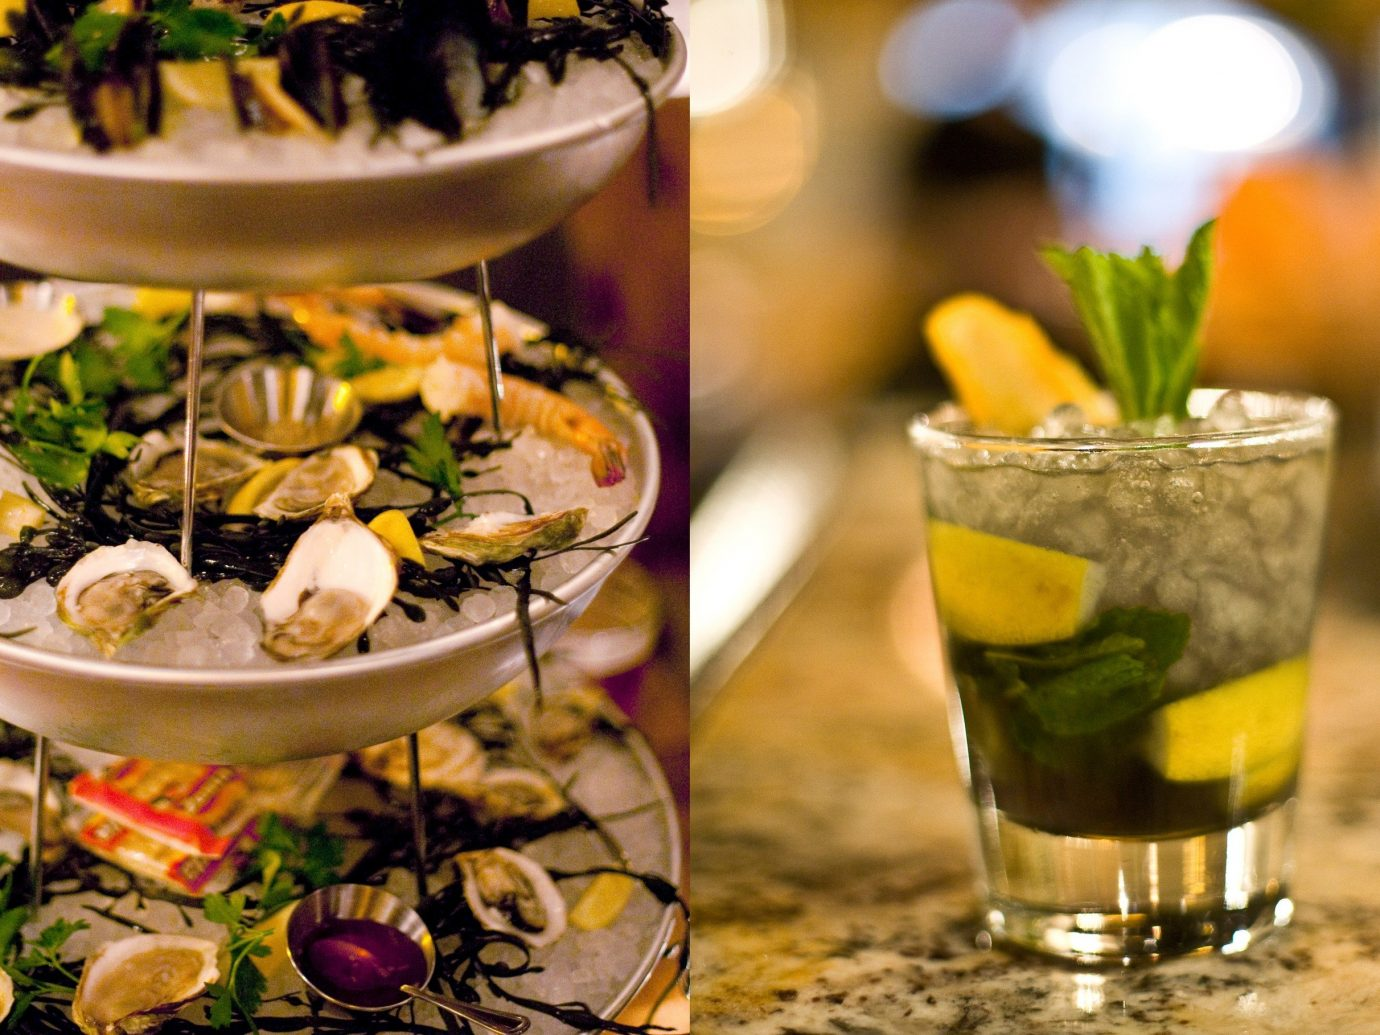 Food + Drink dish meal food brunch produce sense Drink cuisine toppings